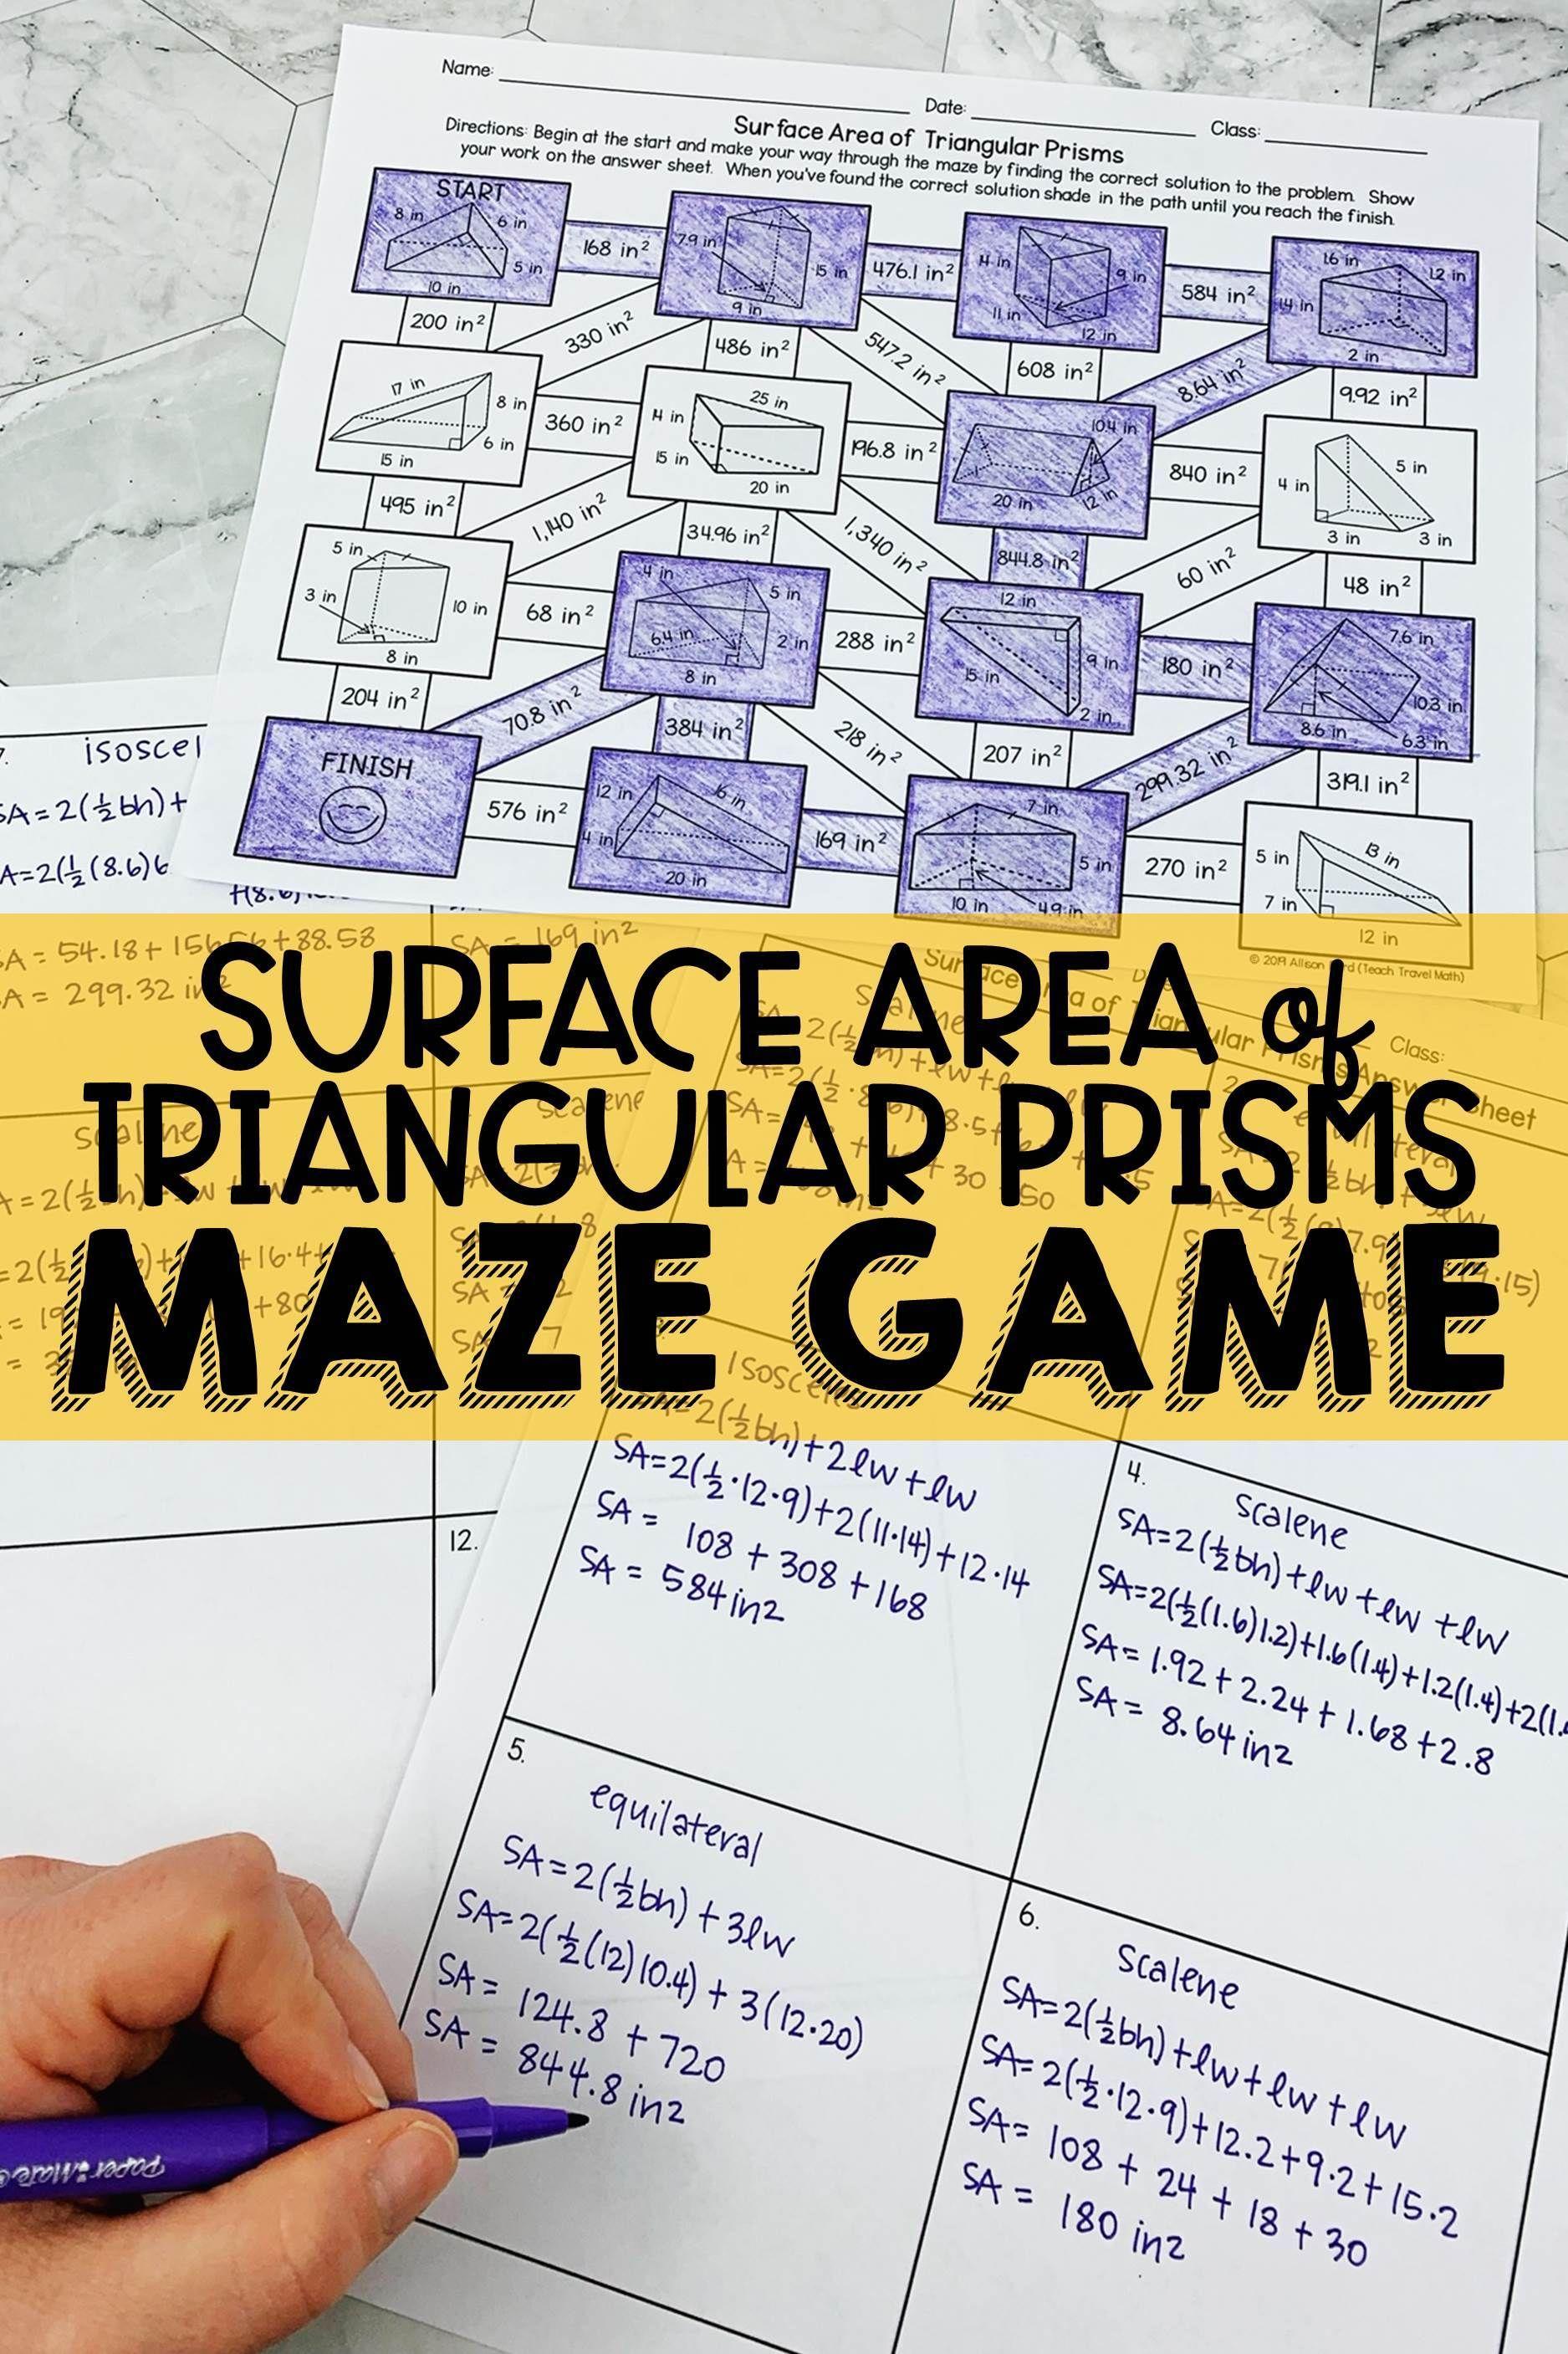 Surface Area Of Triangular Prisms Maze